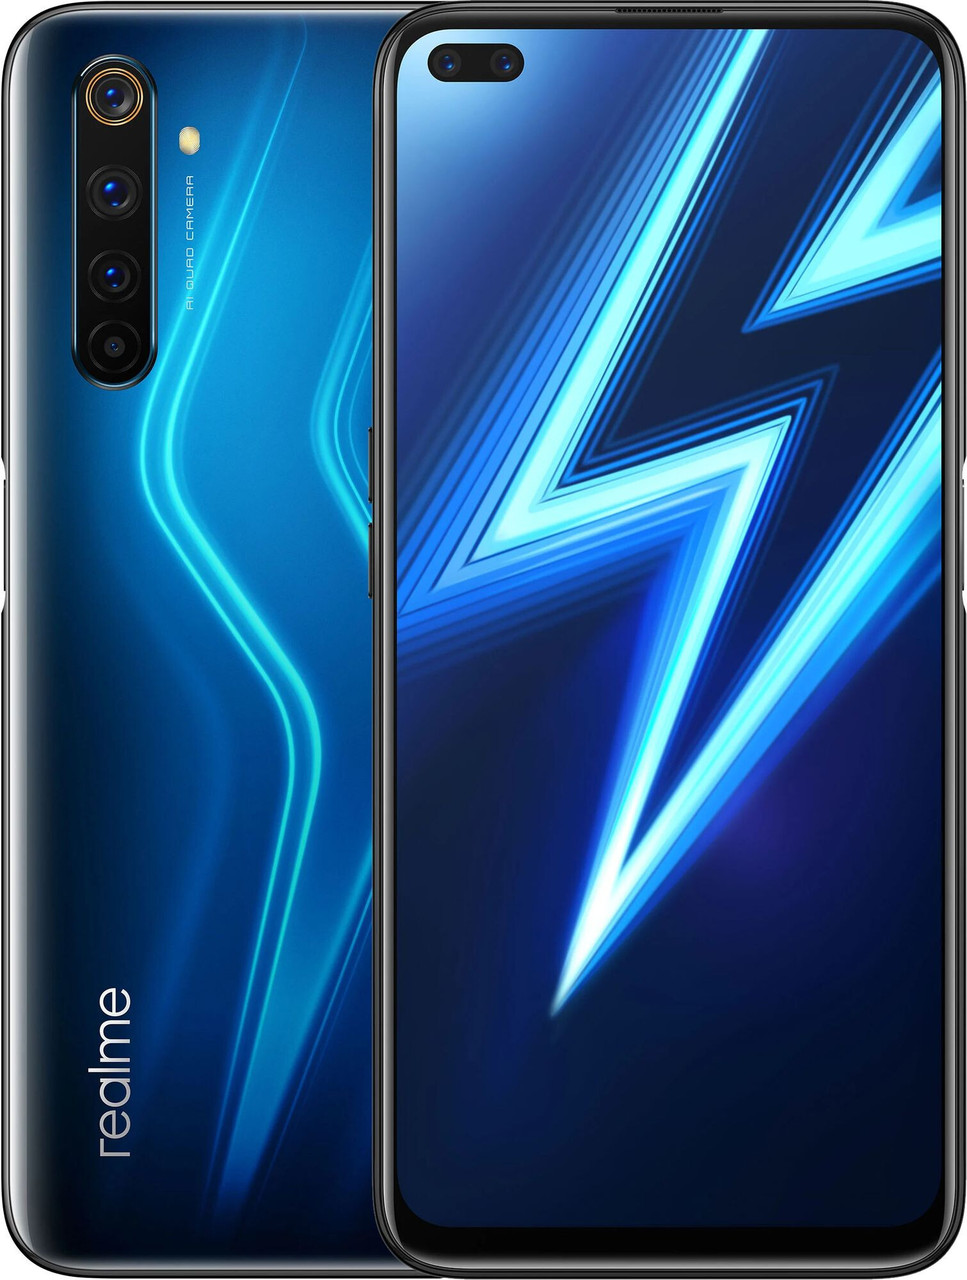 Смартфон Realme 6 Pro 8/128GB Lightning blue